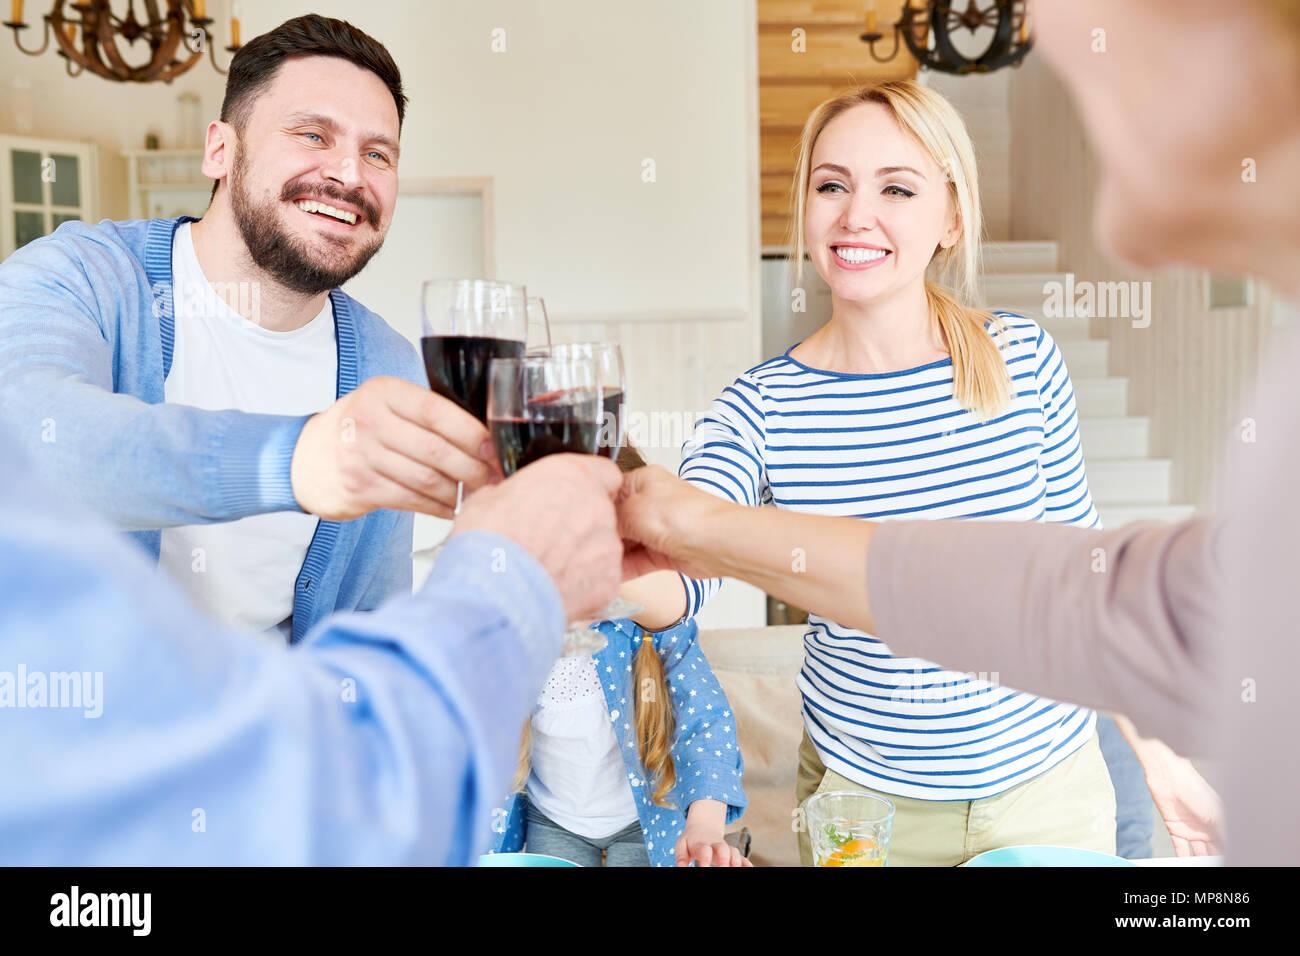 Familie Anstoßen im Holiday Celebration Stockbild